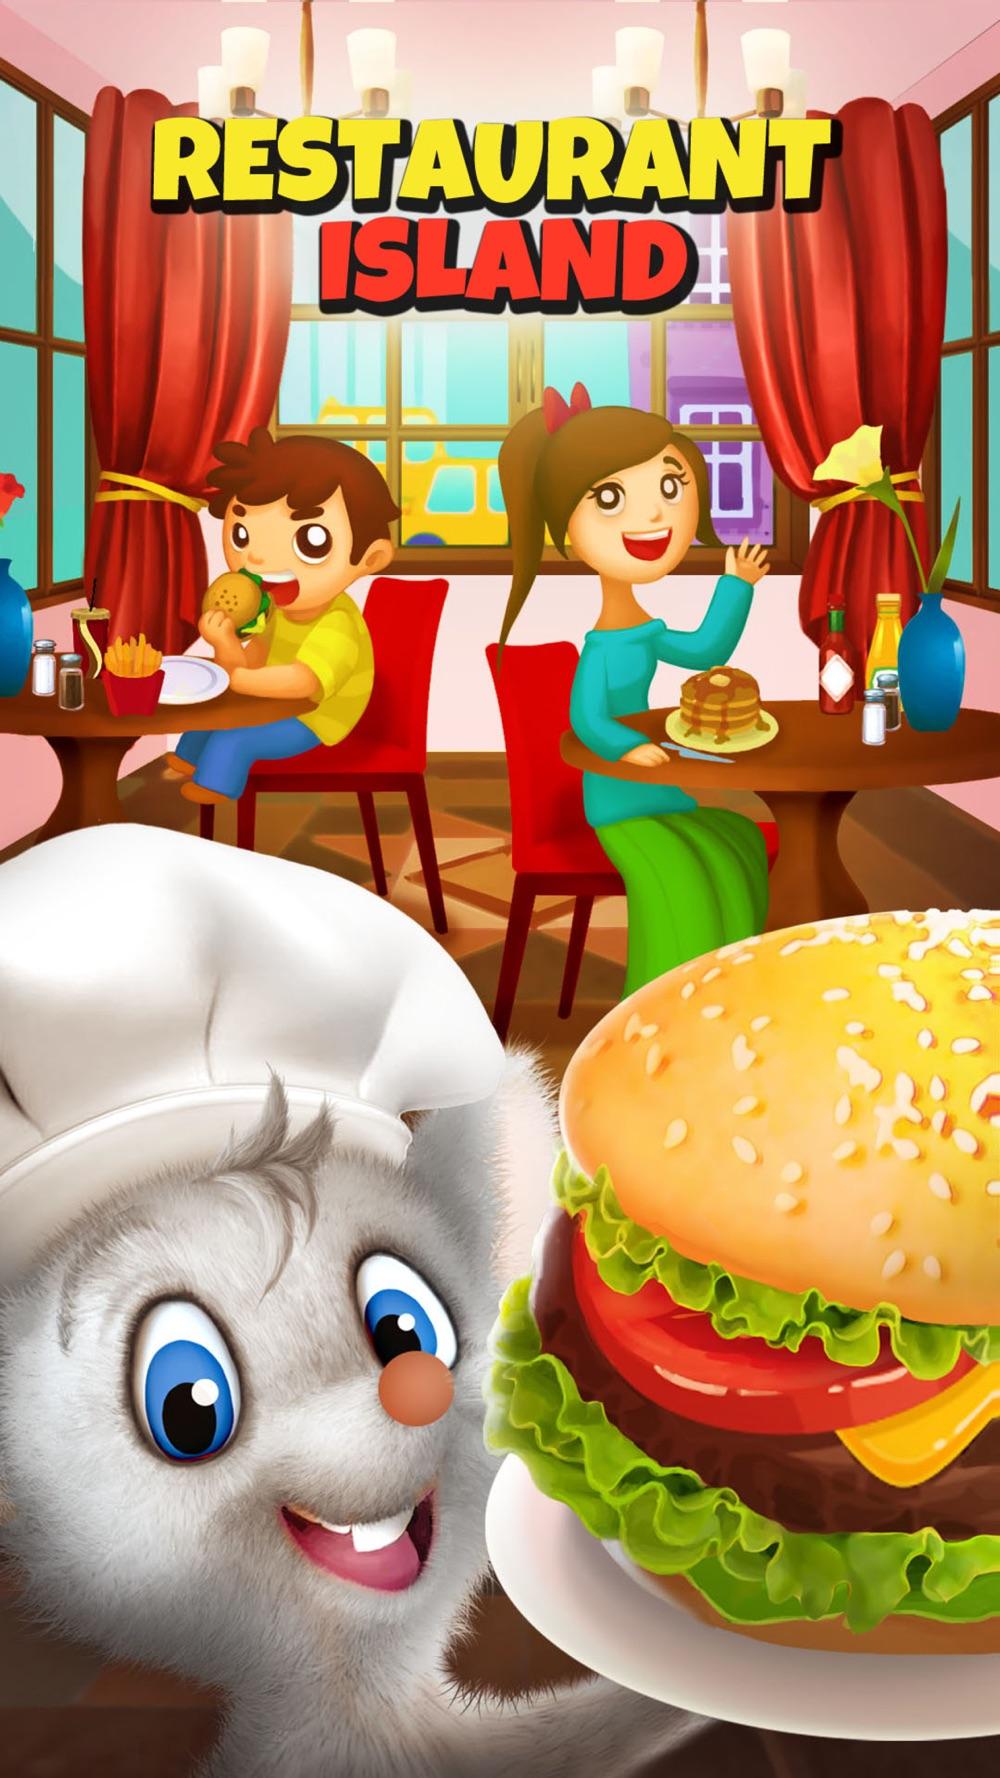 Restaurant Island: Manage your gourmet paradise! Cheat Codes